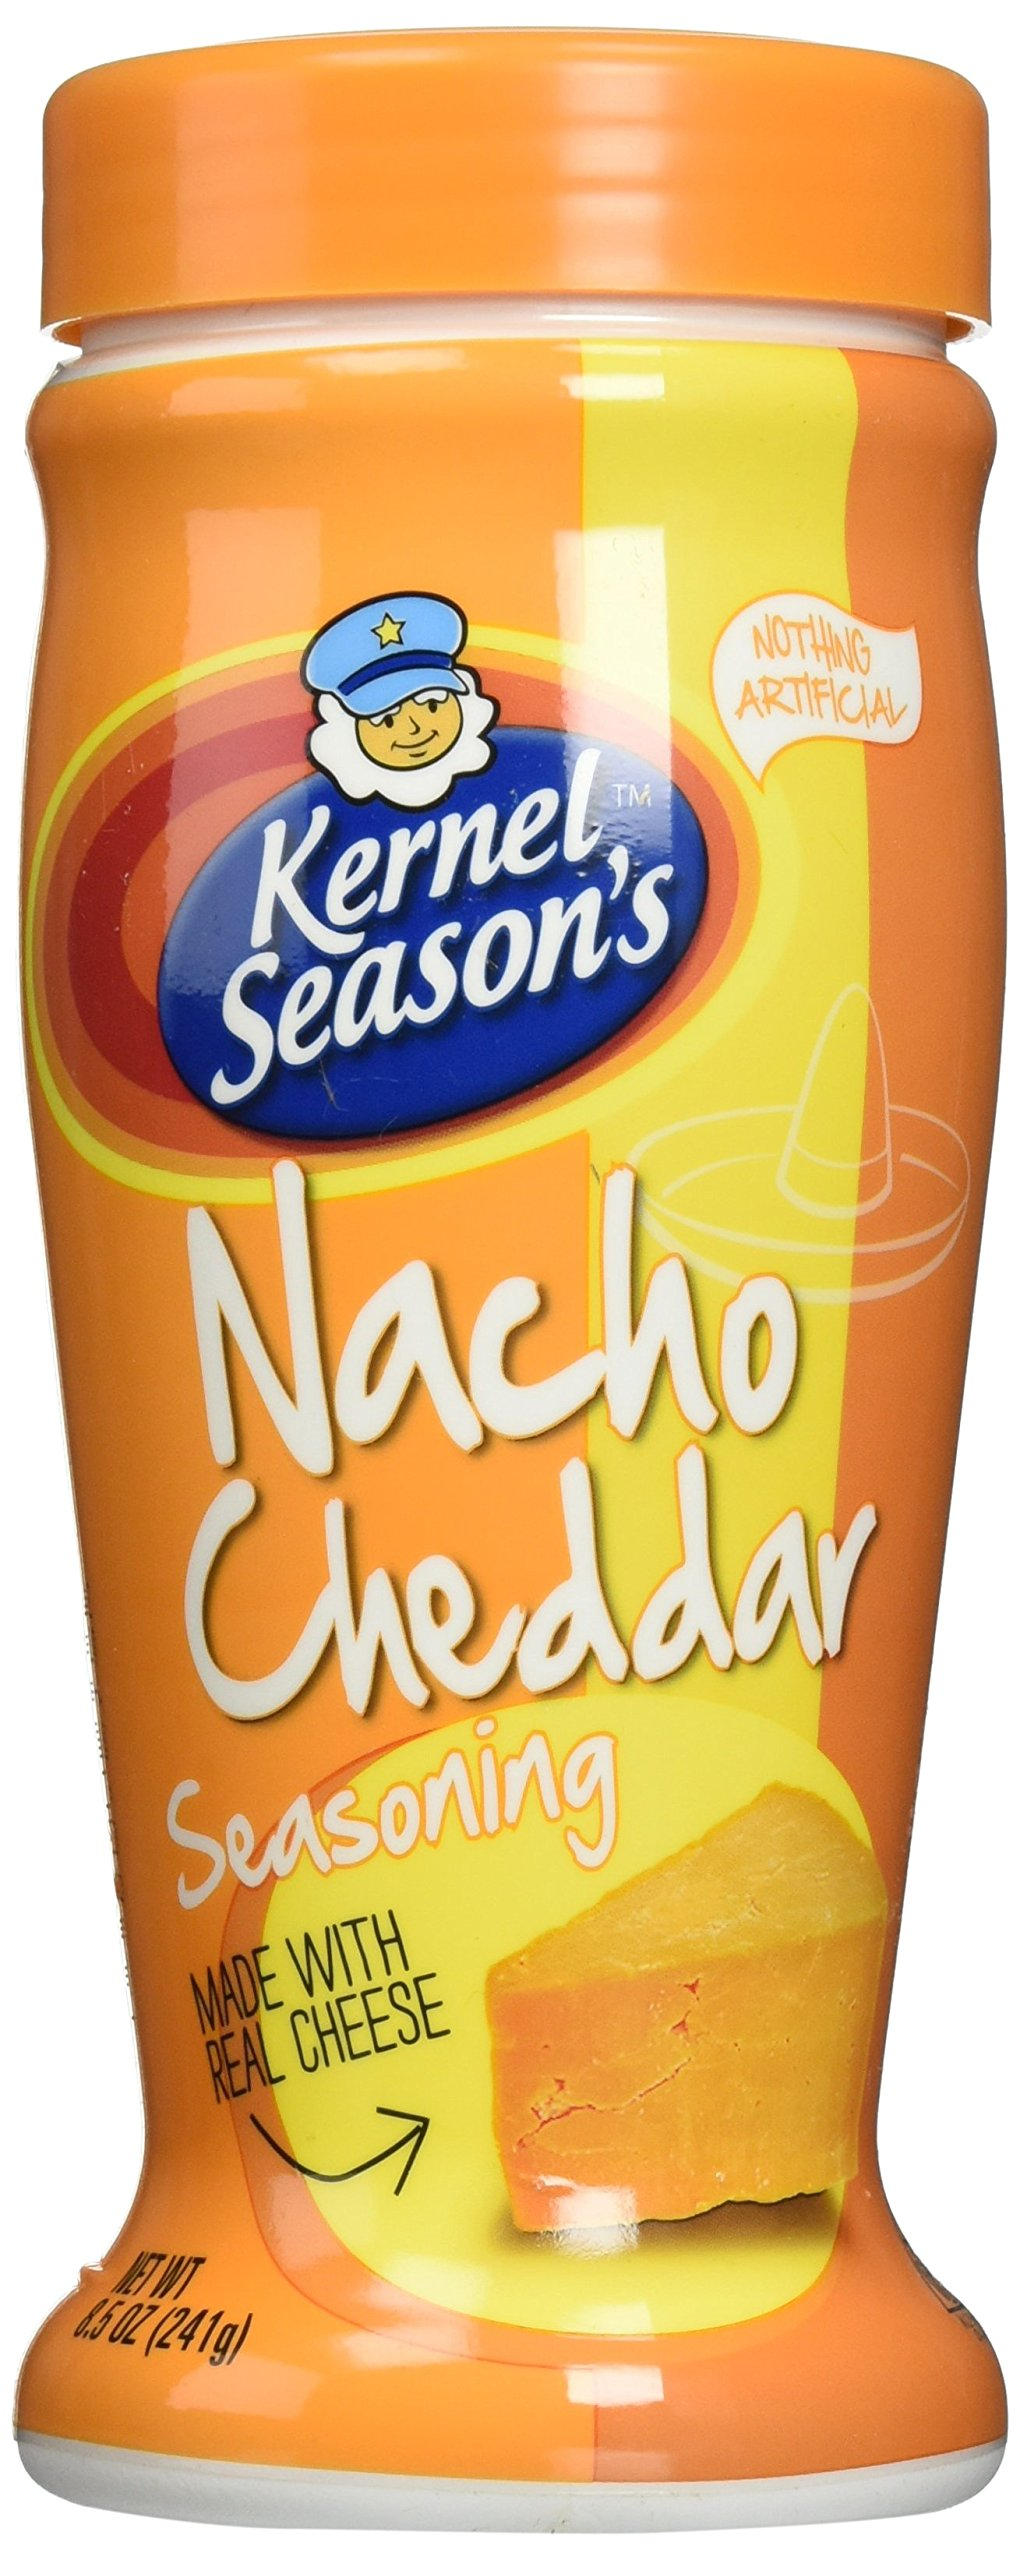 Kernel Season's Nacho Cheddar Seasoning, 8.5 Ounce Shakers (2 Pack)